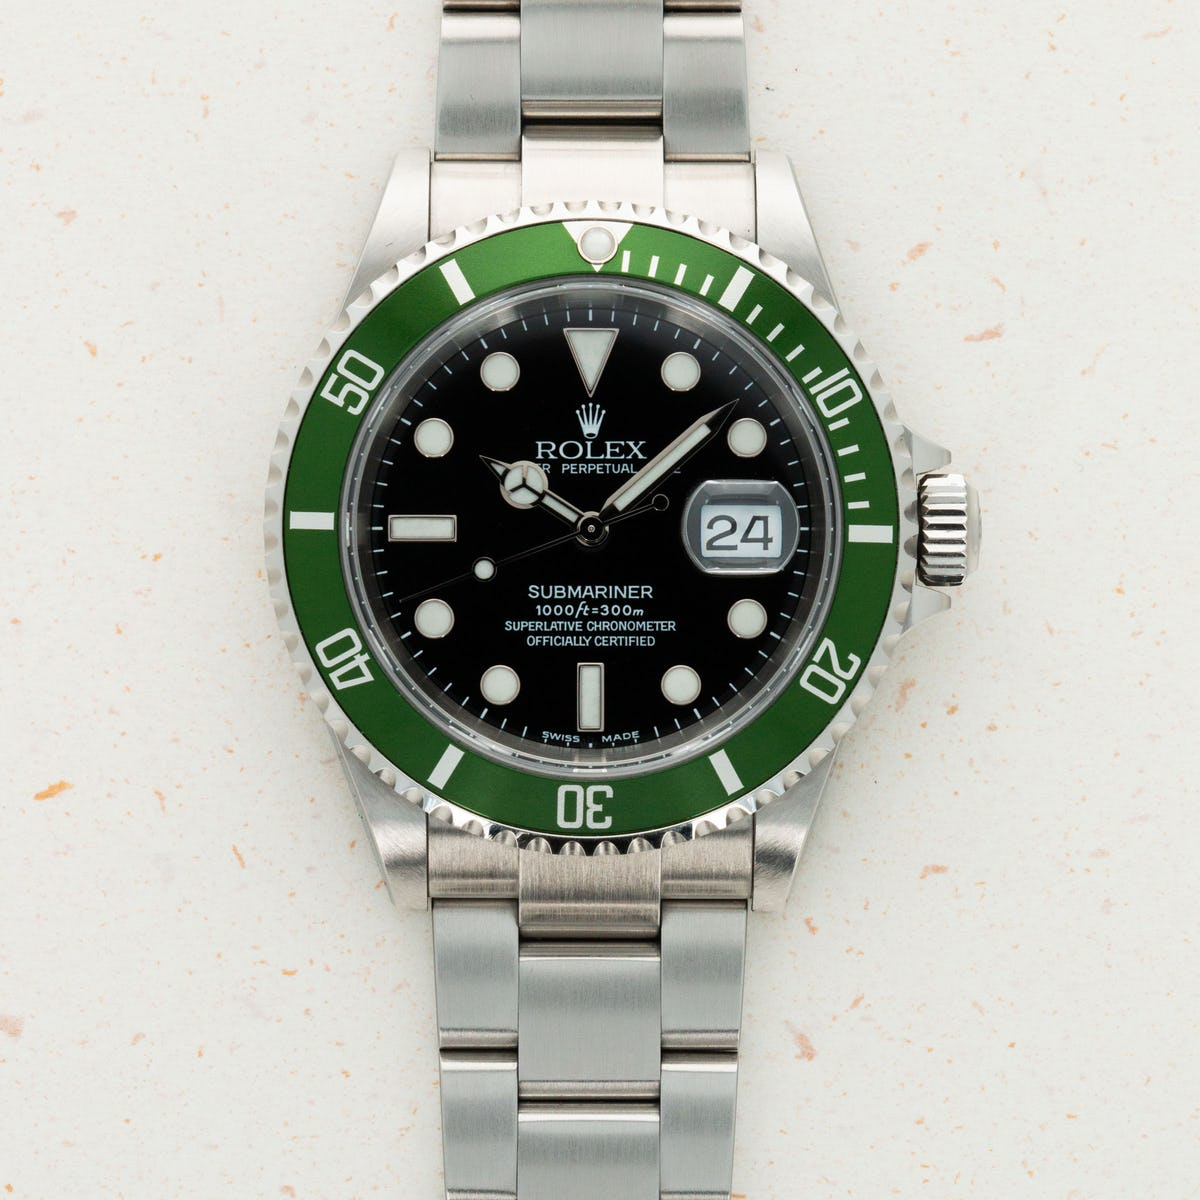 Thumbnail for Rolex Submariner Green Anniversary Flat 4 Kermit 16610LV